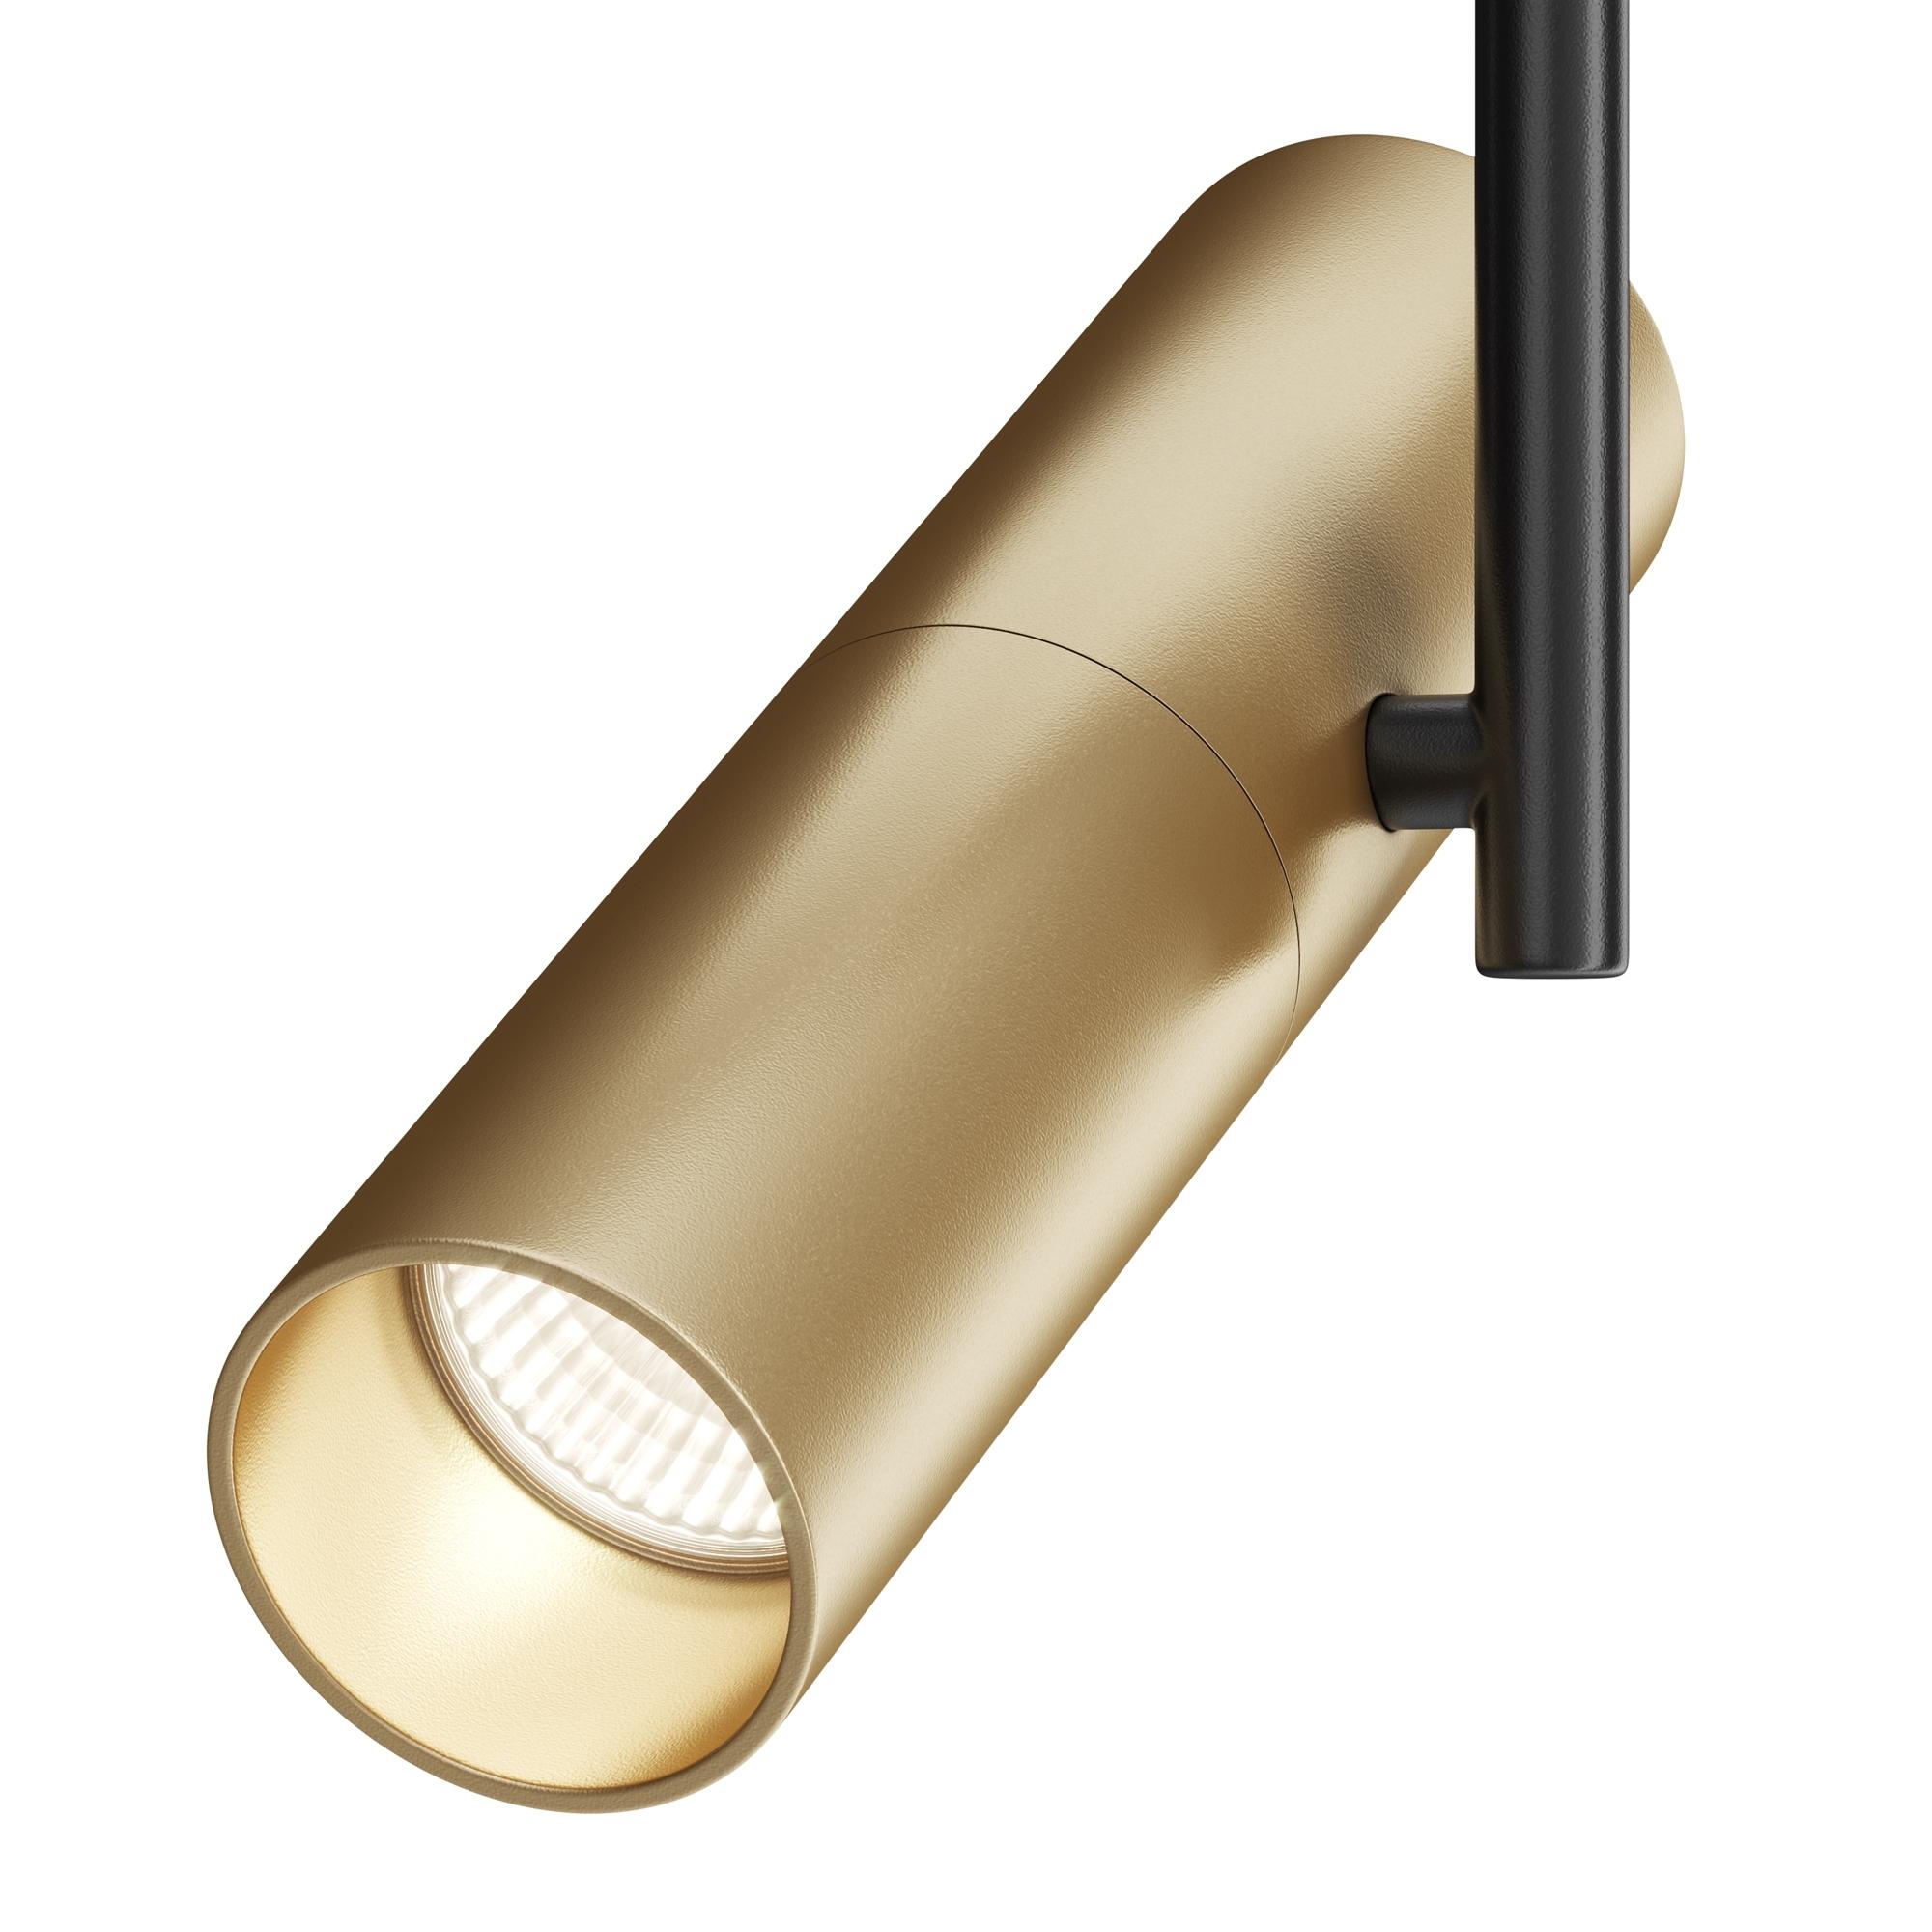 Светильник Maytoni Elti TR005-1-GU10-BG, 1xGU10x50W, черный, золото, металл - фото 4